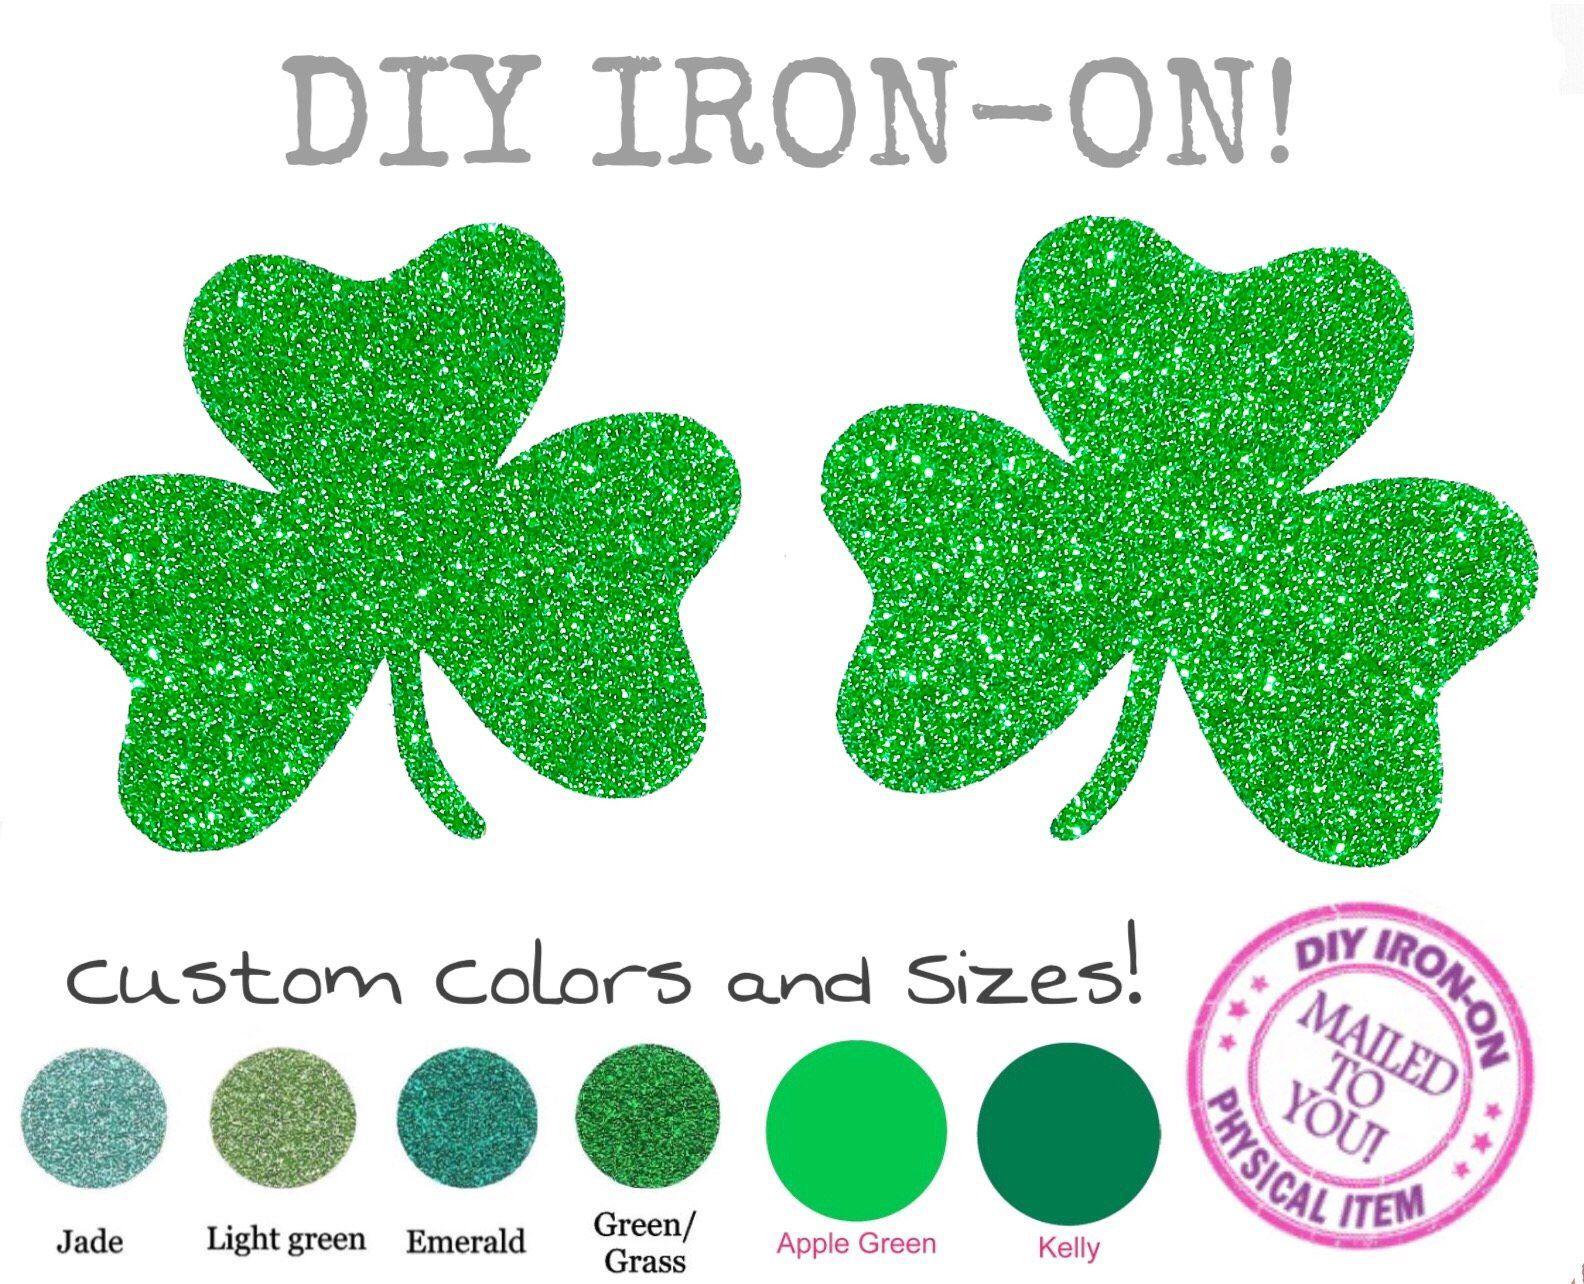 Diy Clover Bra Top Shamrock Iron On Applique St Patricks Day Etsy St Patrick S Day Diy Iron On Applique St Patricks Day